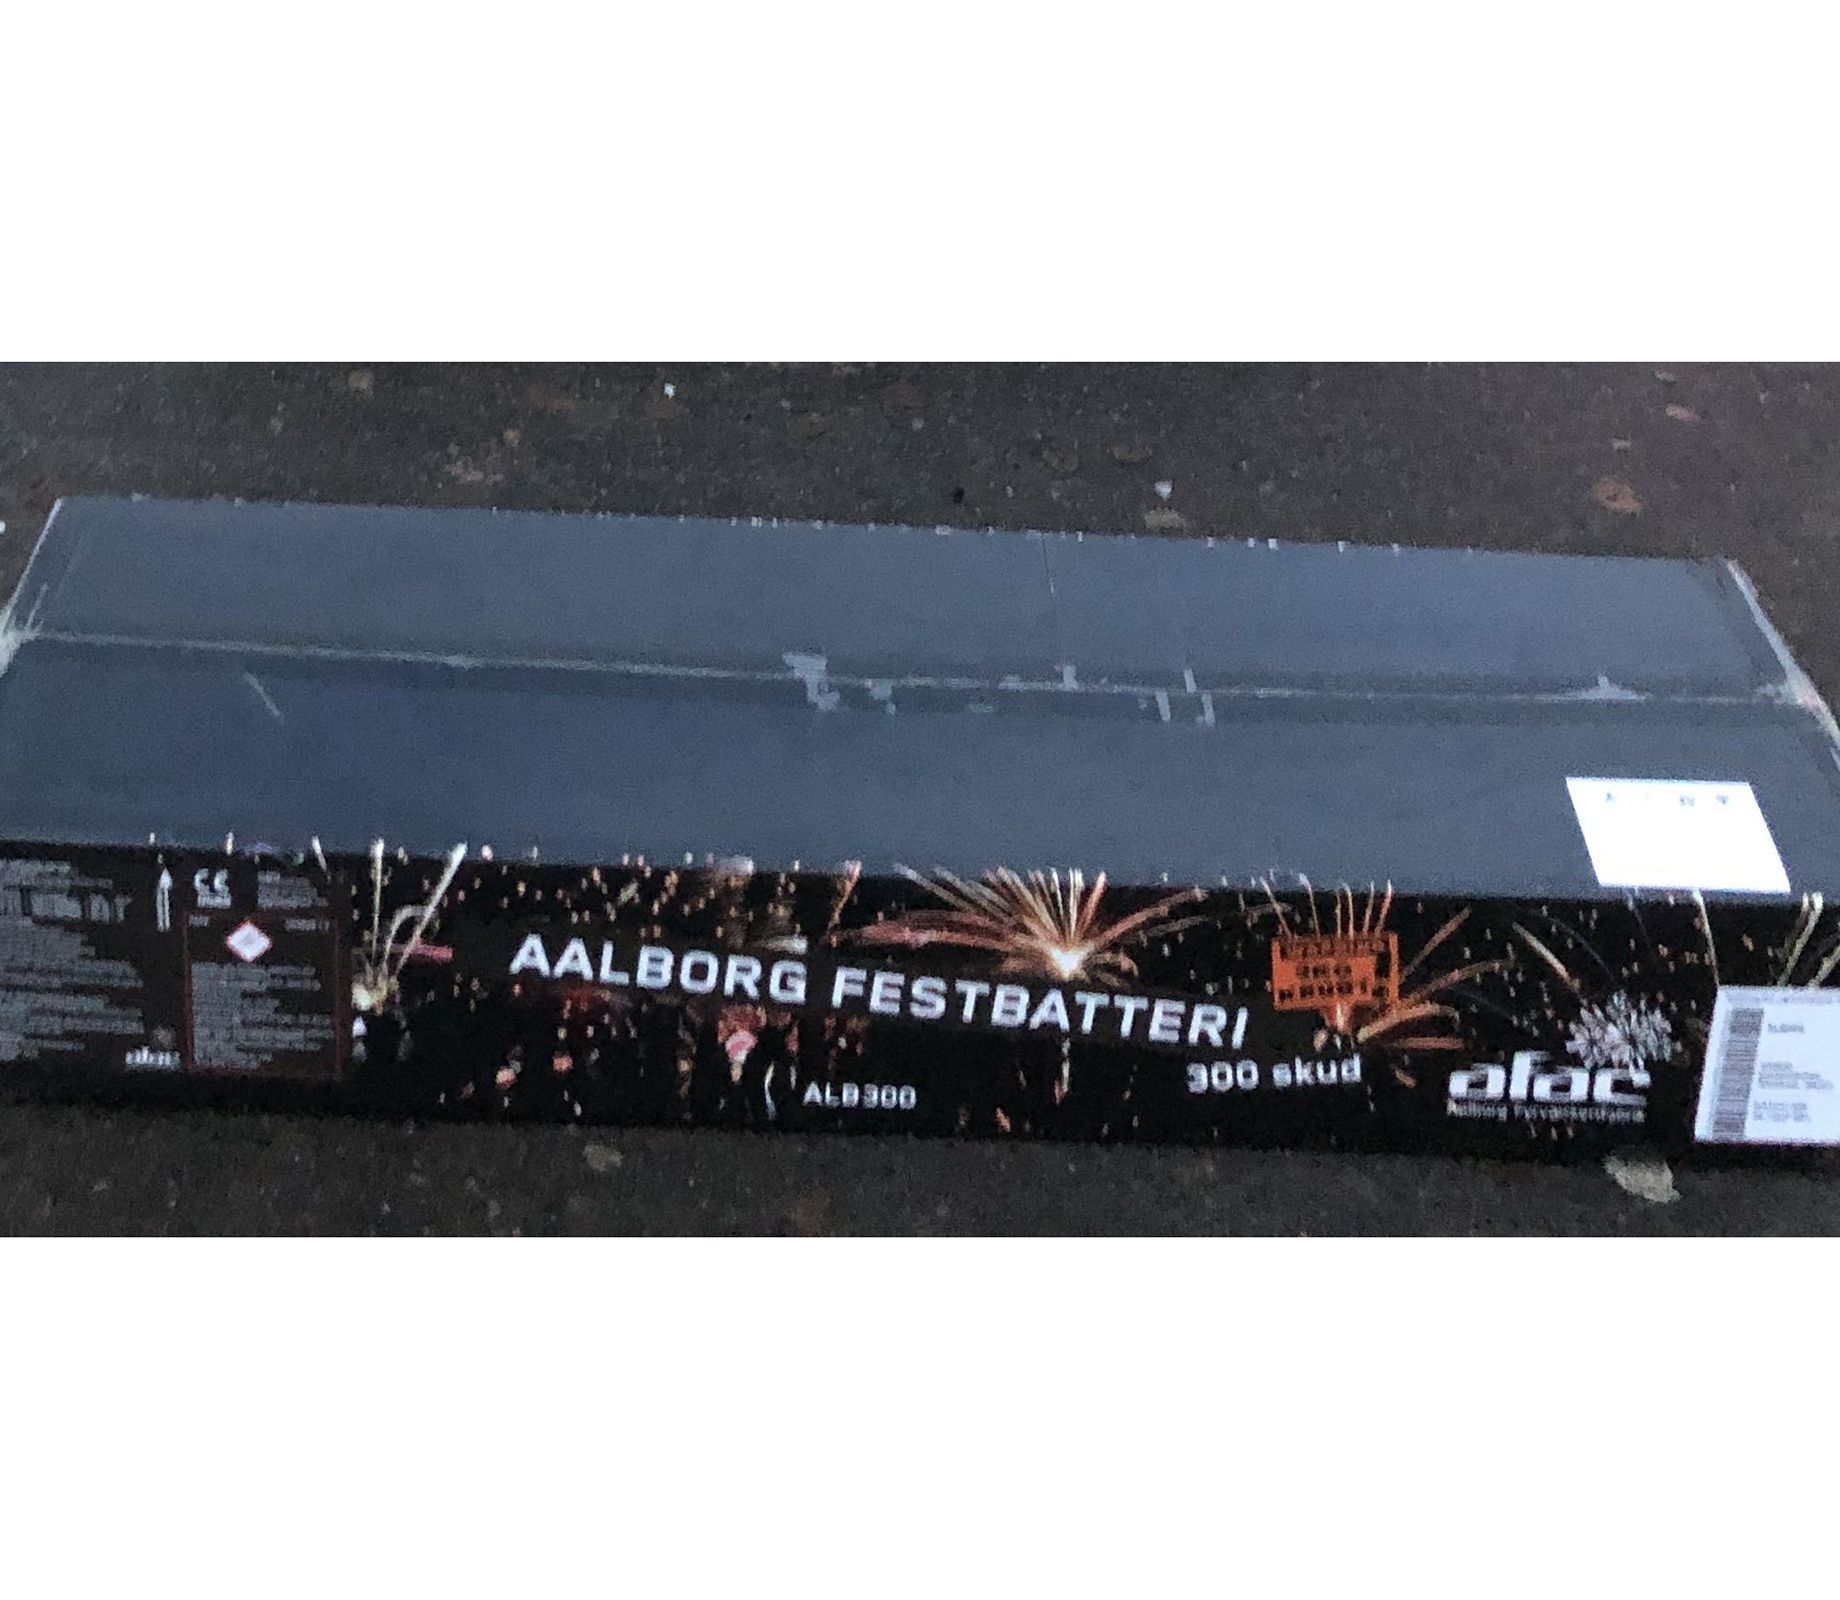 Pas på denne: Sikkerhedsstyrelsen advarer mod et Aalborg Festbatteri